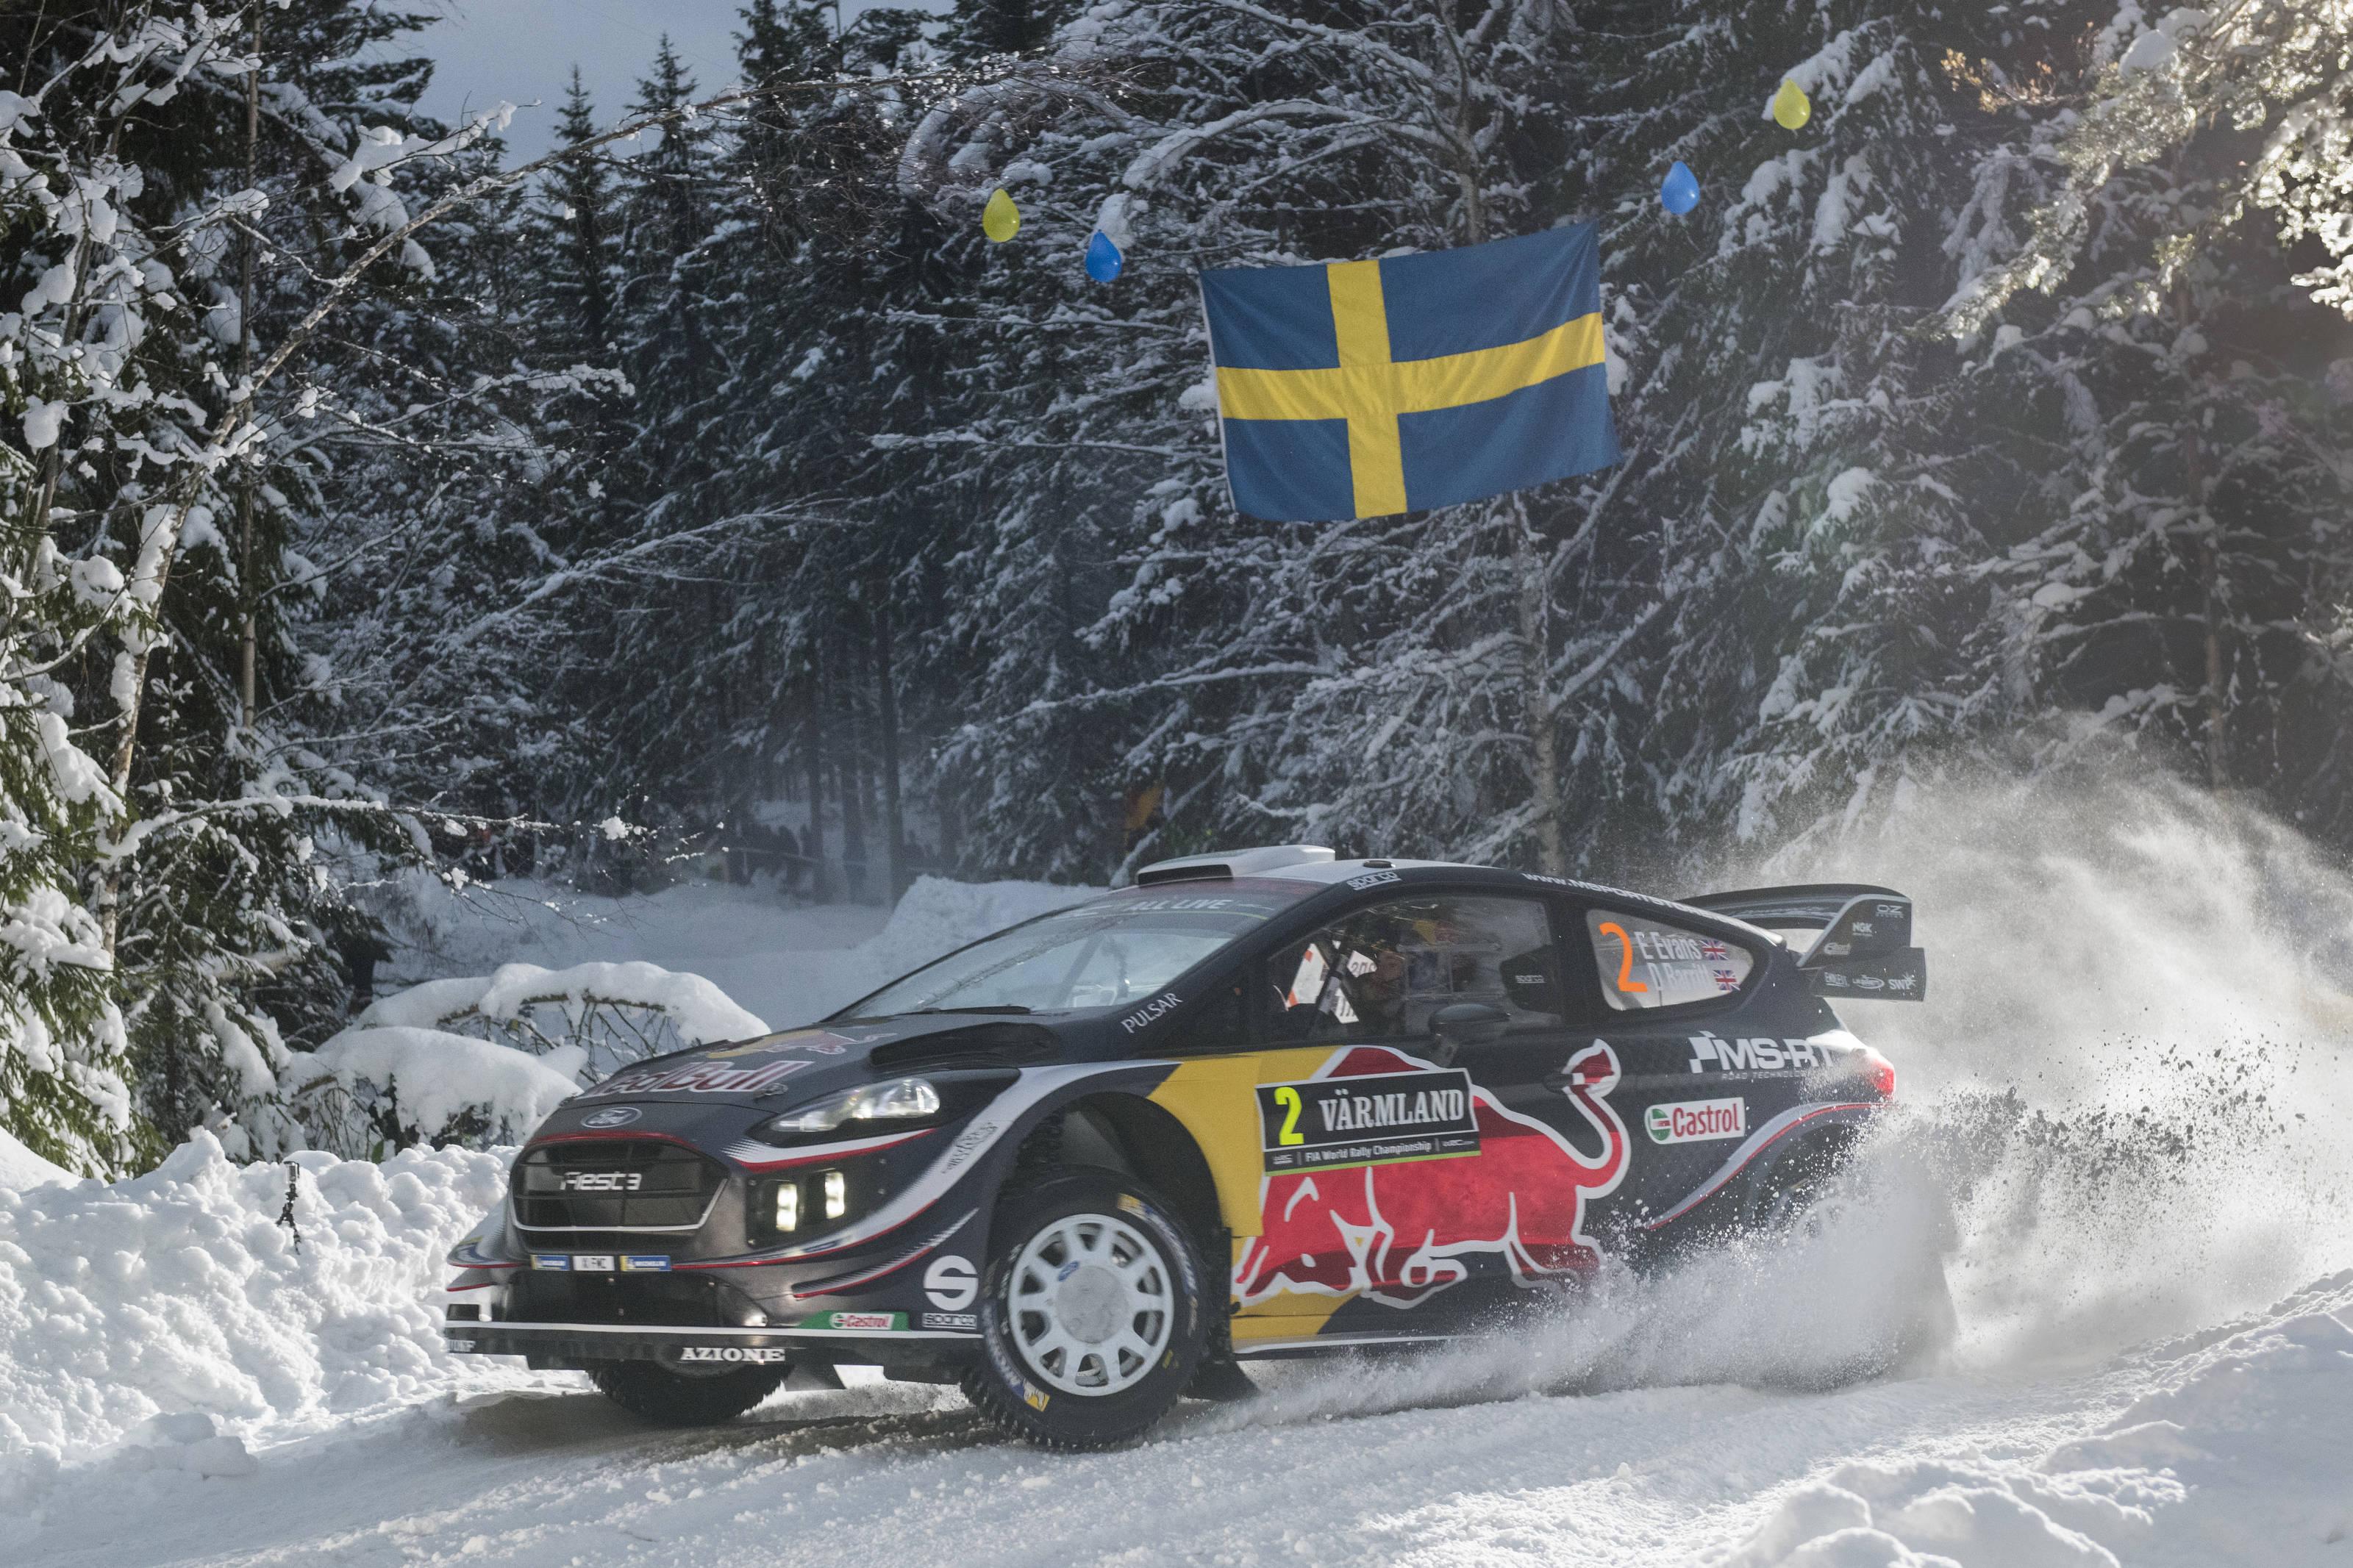 wrc 2018 rally sweden press conference federation internationale de l 39 automobile. Black Bedroom Furniture Sets. Home Design Ideas